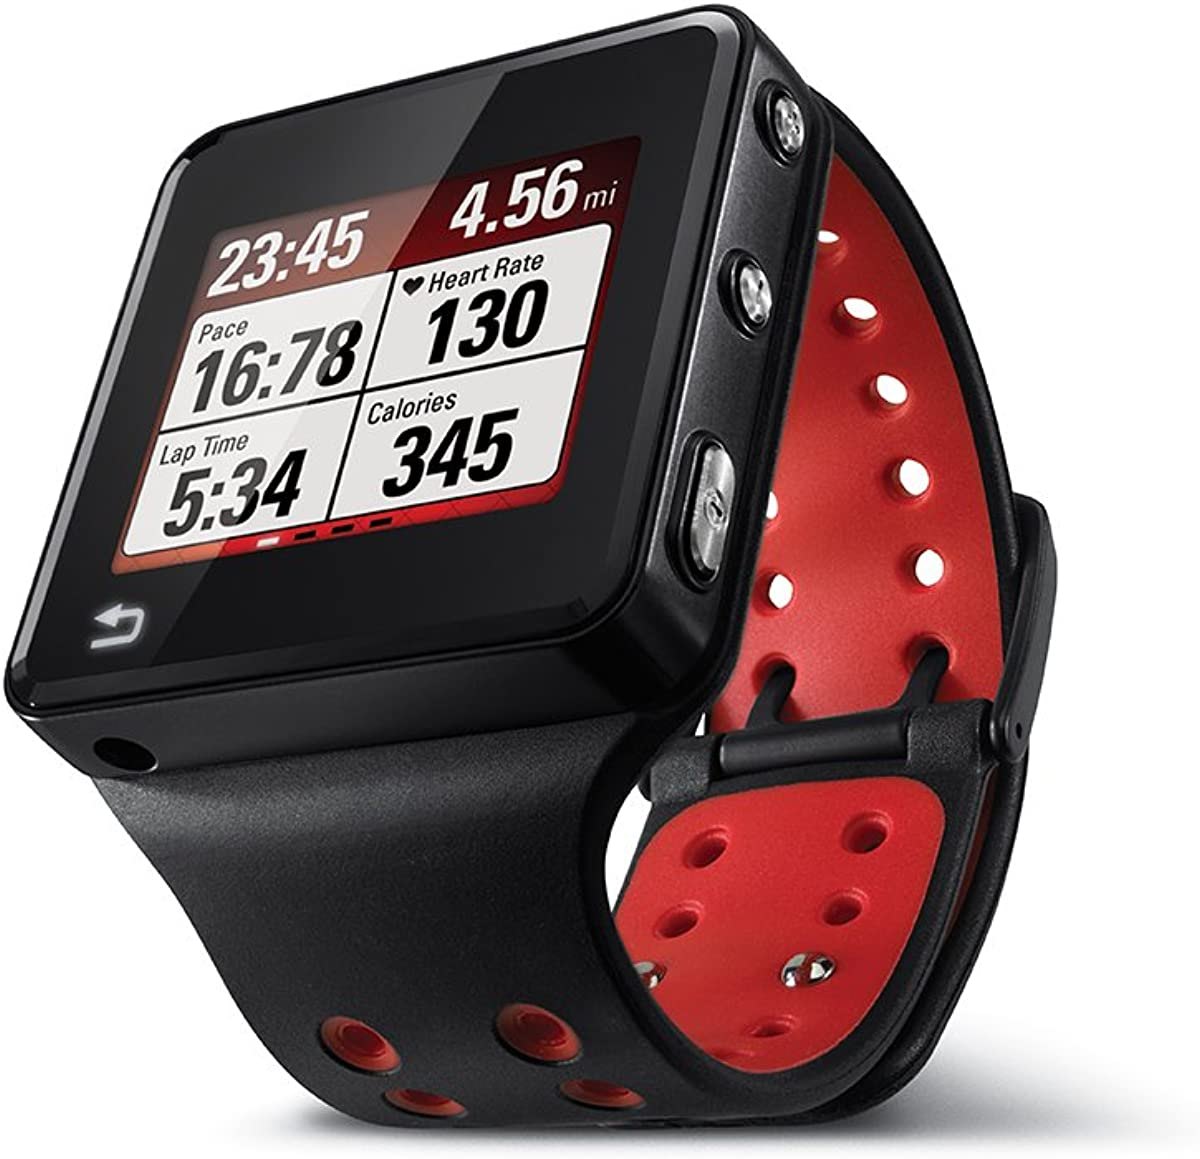 Motorola MOTOACTV 8GB GPS Sports Seattle Mall Watch MP3 and Wrist Player with Safety trust